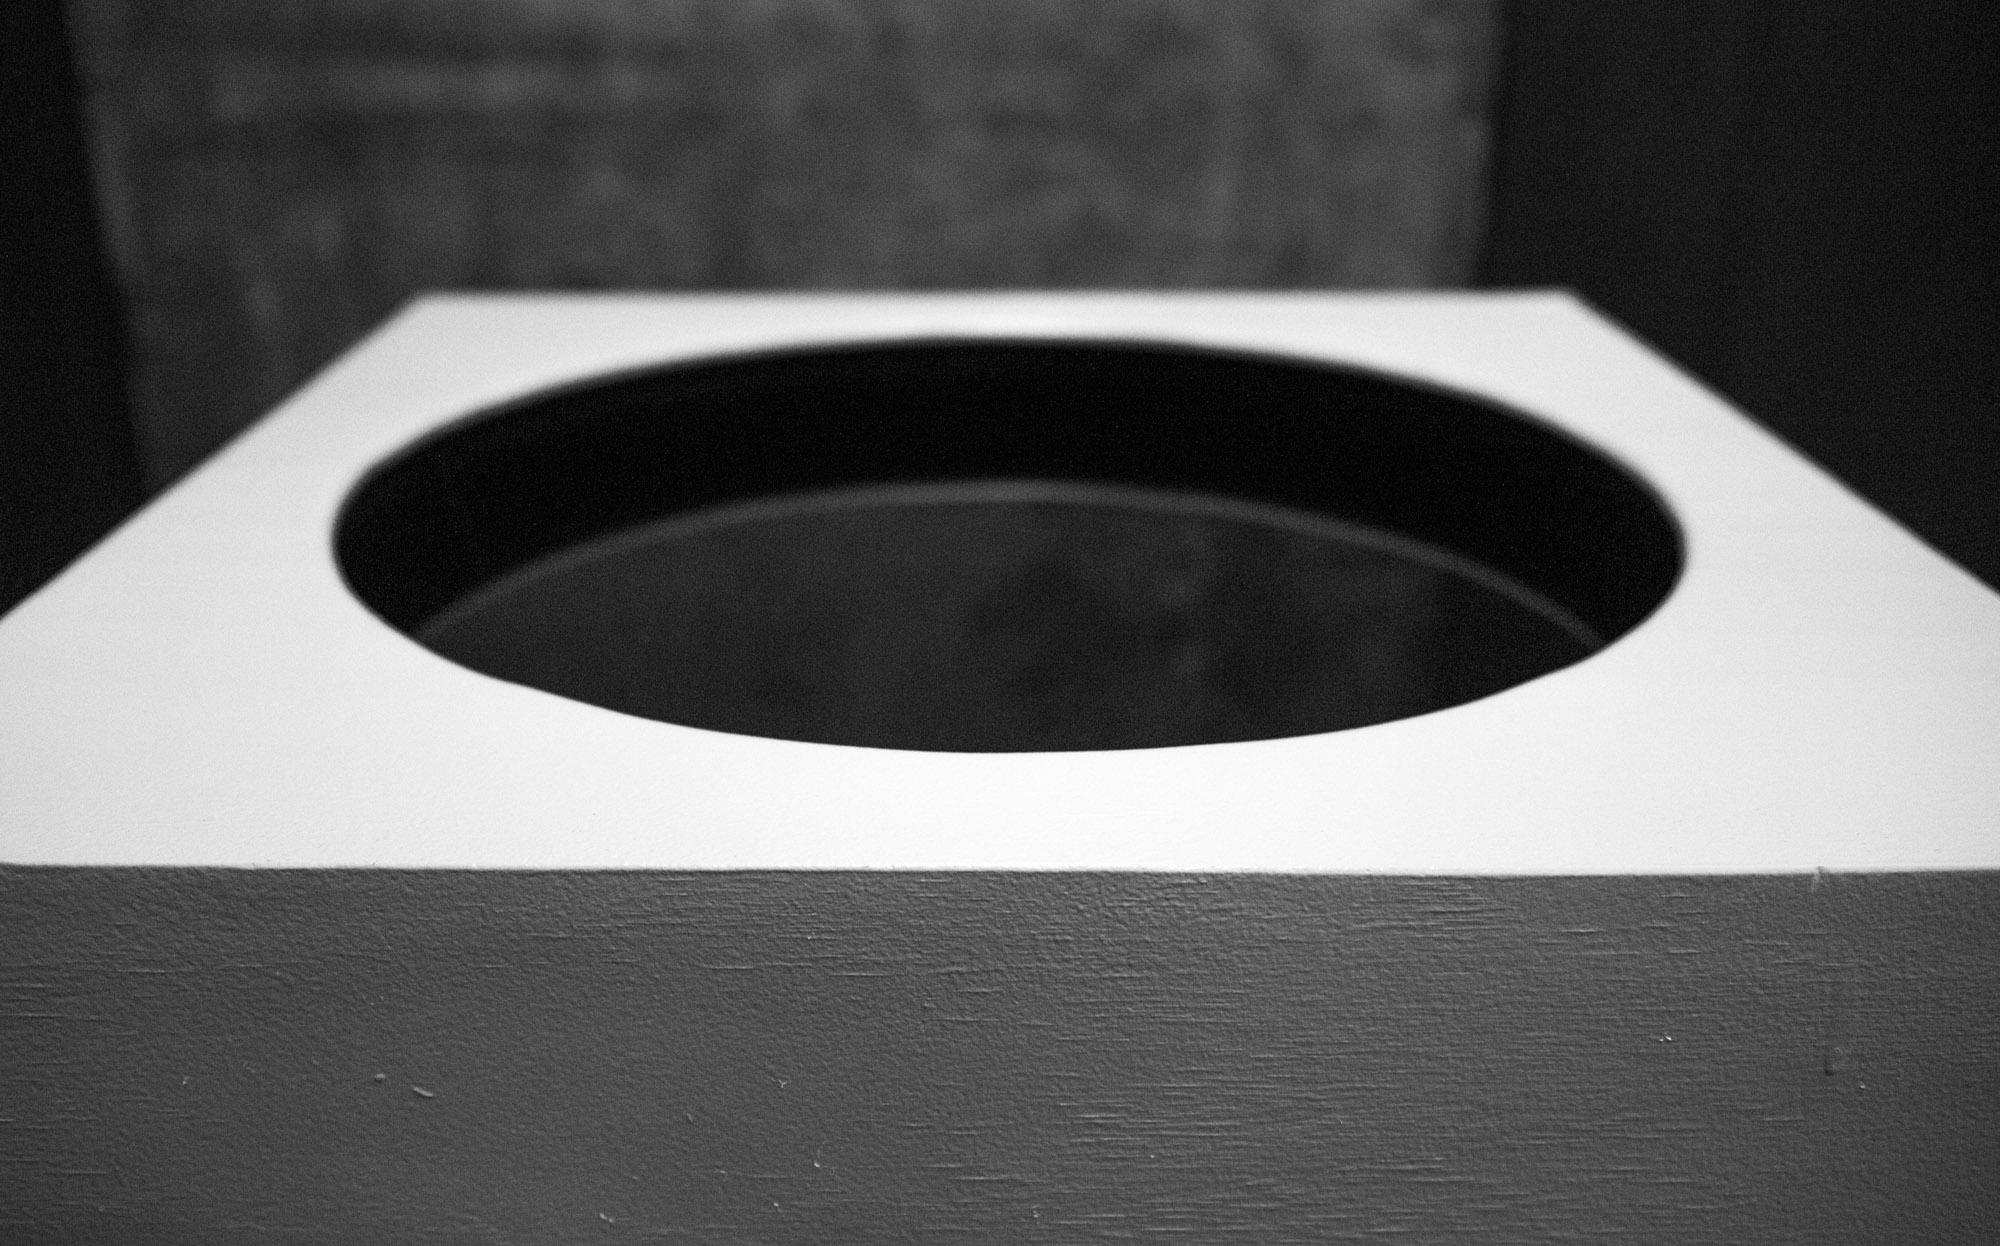 Sara Retallick,  Portal , 2018, 2-channel underwater  sound, transducers, electronics, wooden plinth, warm water, plastic drum, 9 min variation on loop, 1120 x 600 x 600 mm